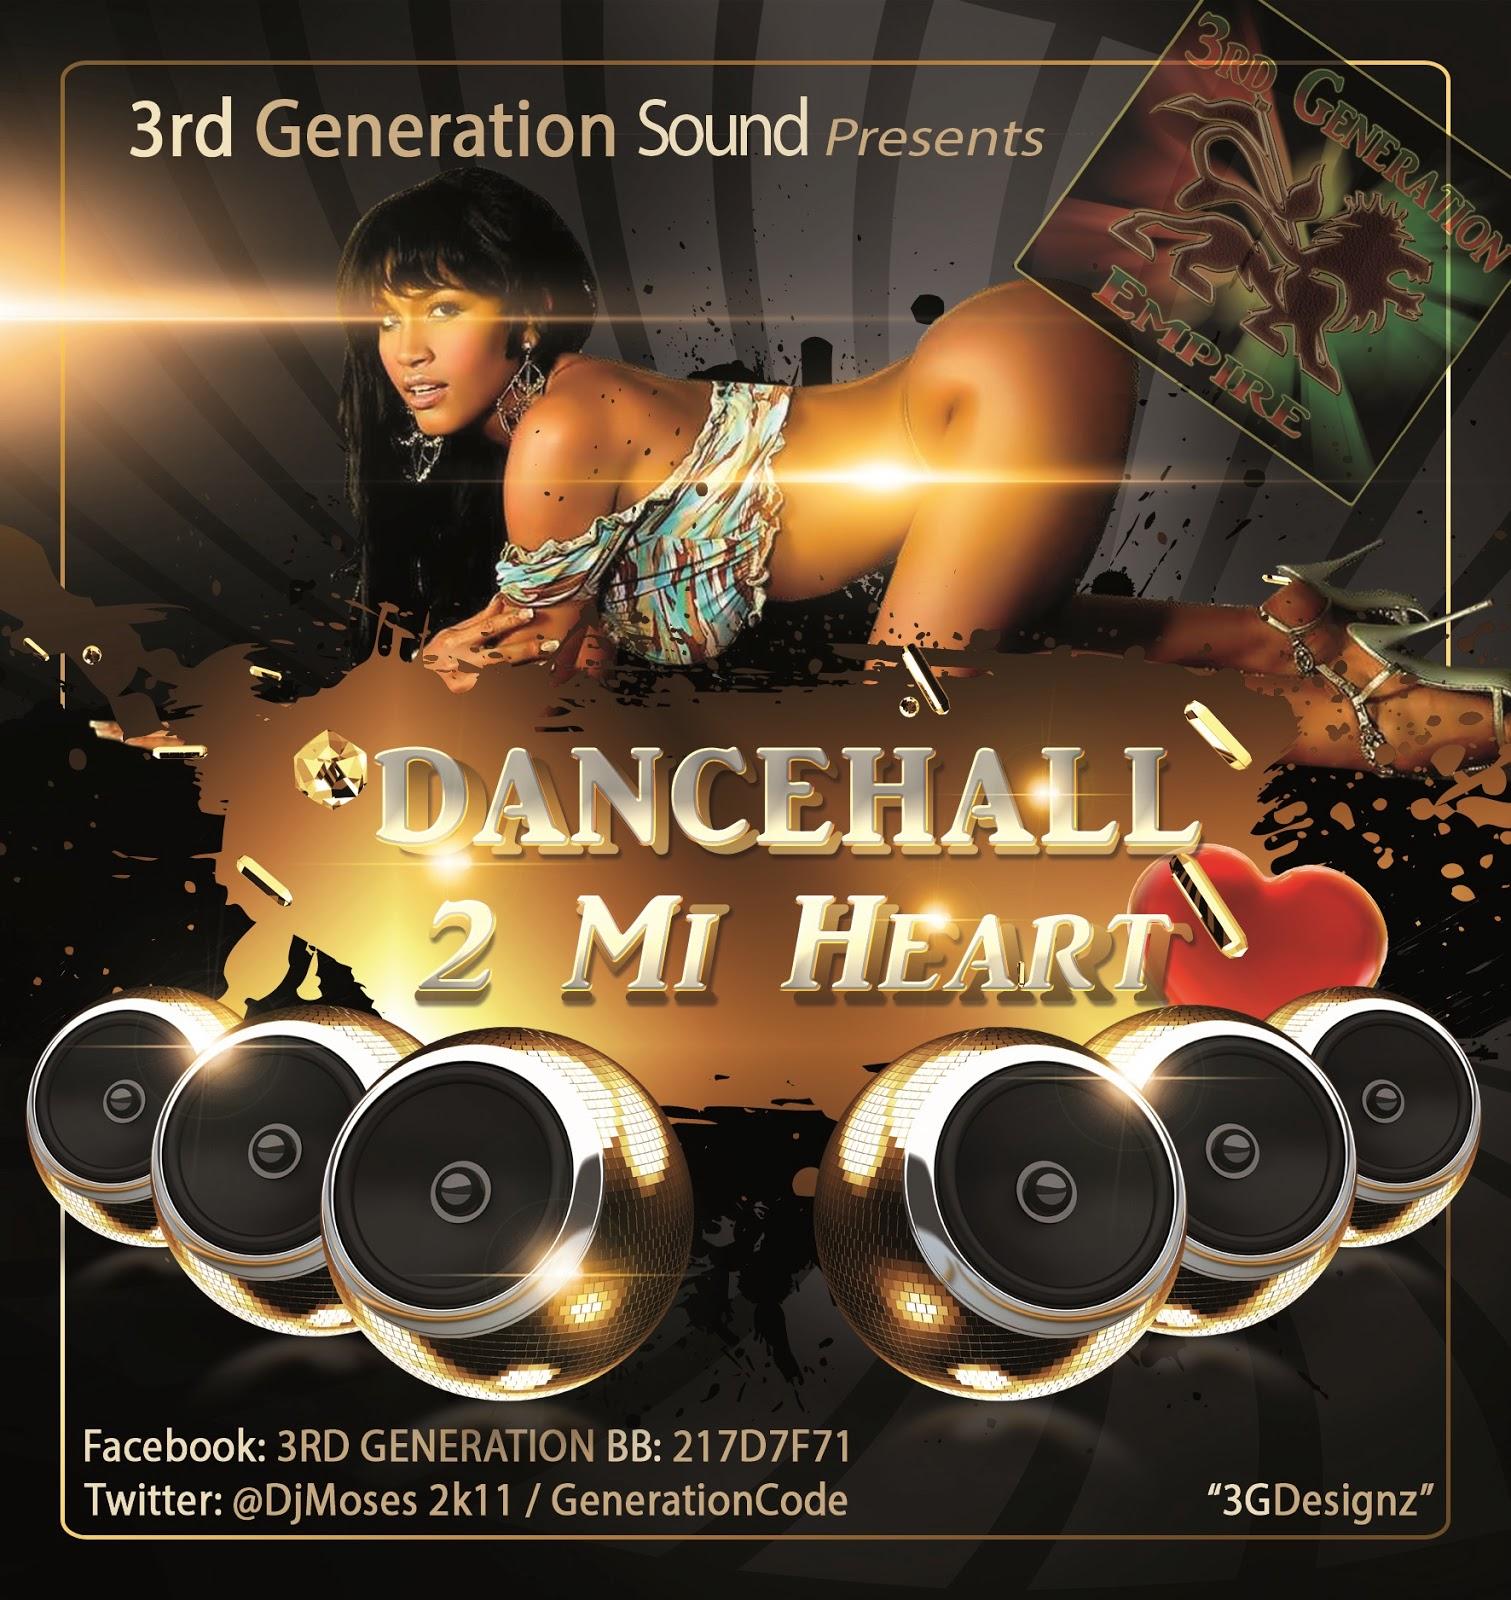 Dancehall HipHop Mixtapes - New Vision Sound: May 2013